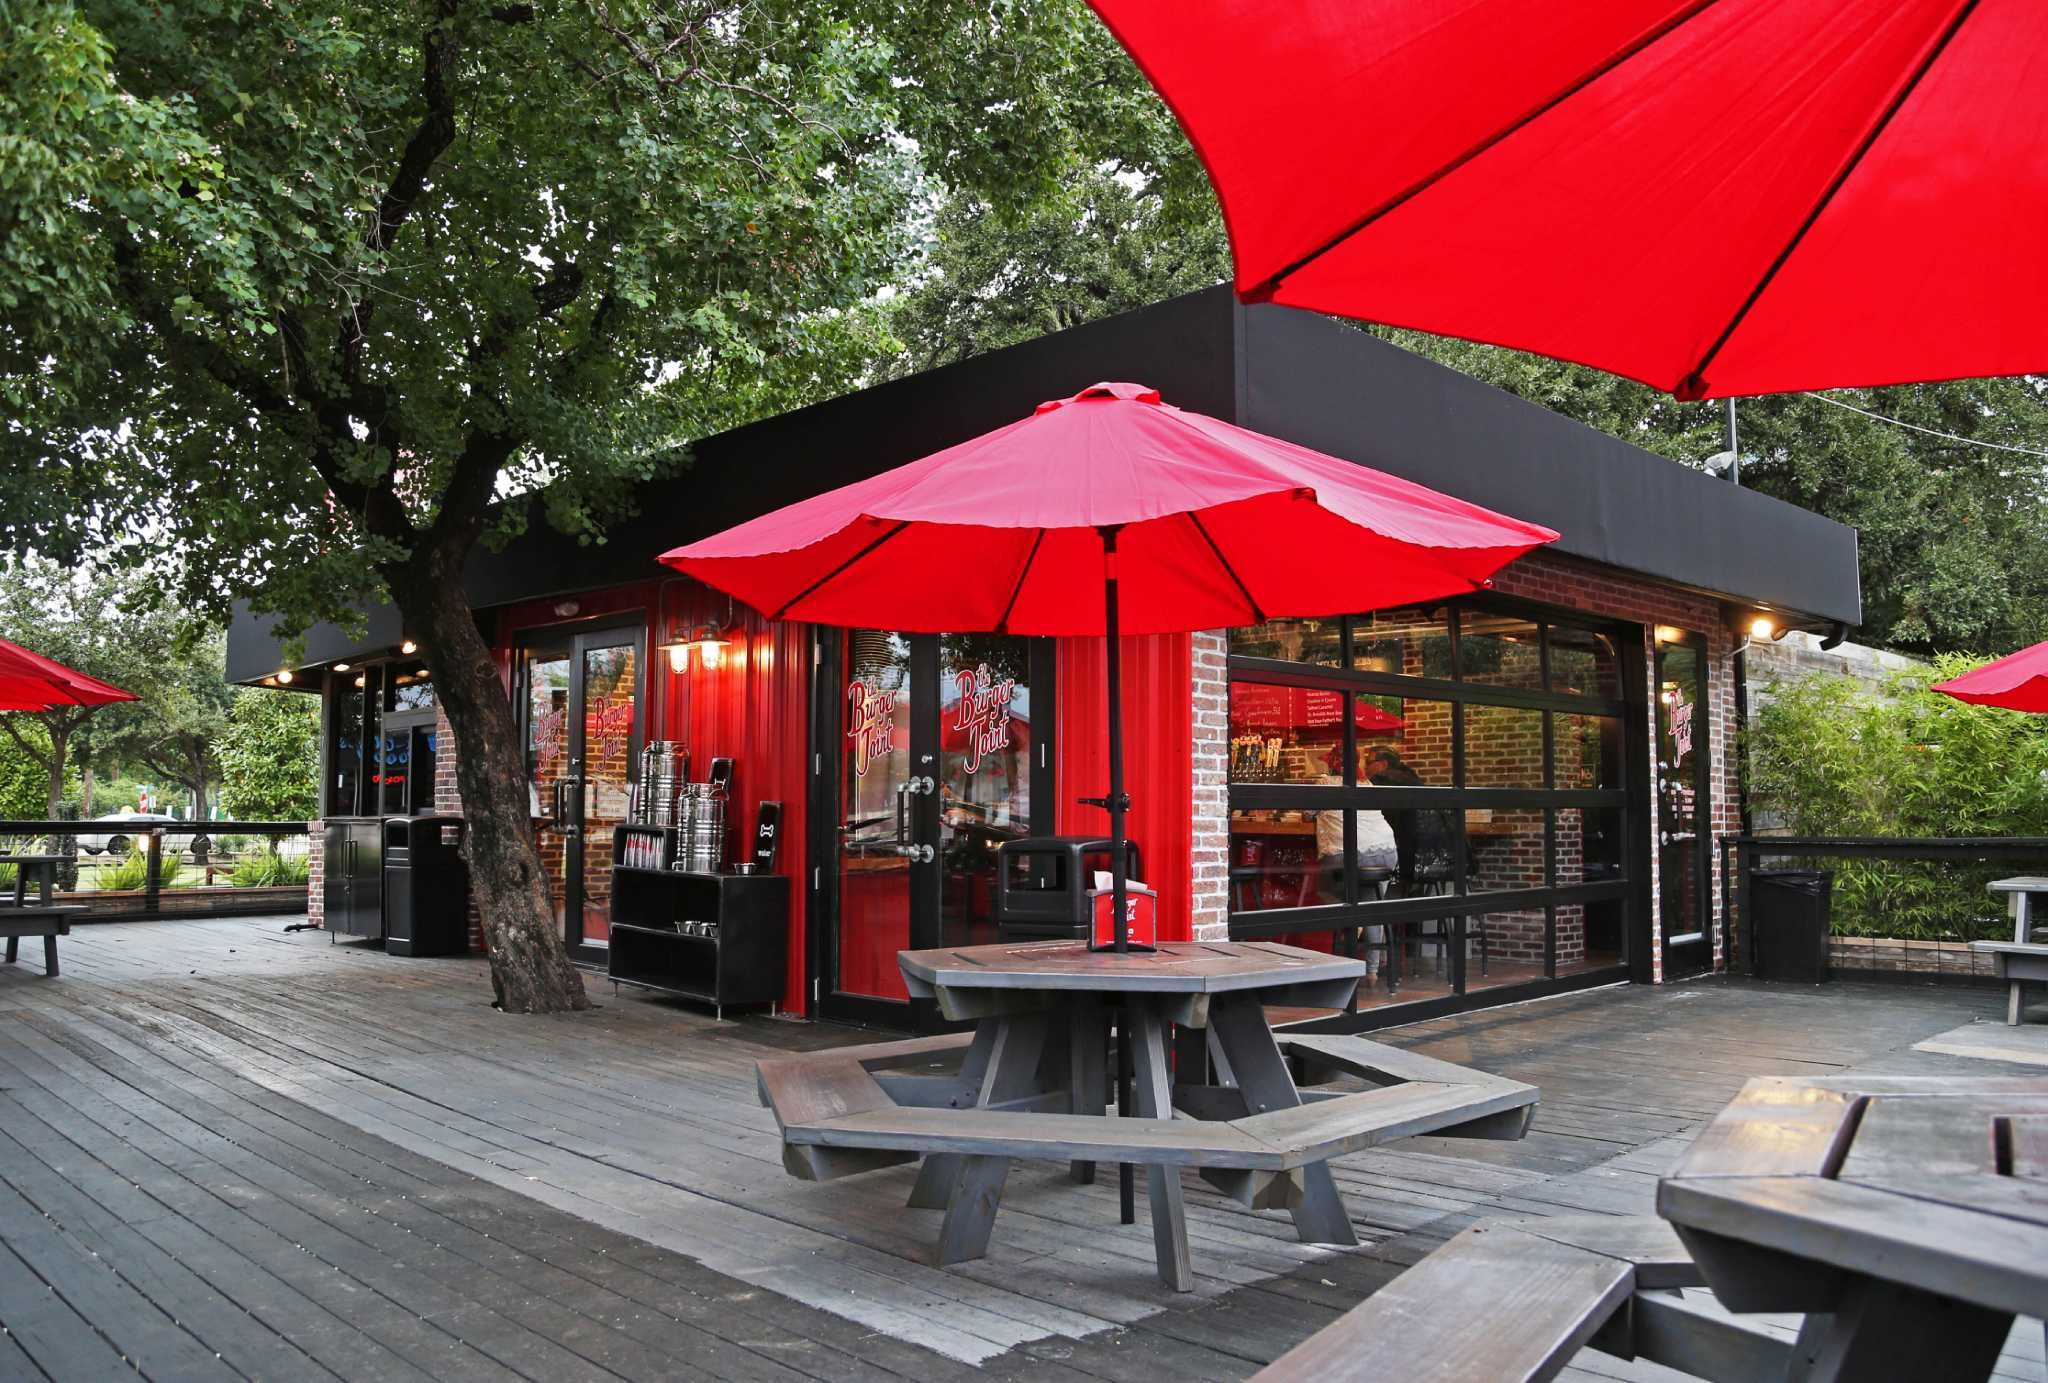 Houston S Dog Friendly Bars Restaurants Dog Friends Houston Bars Houston Restaurants